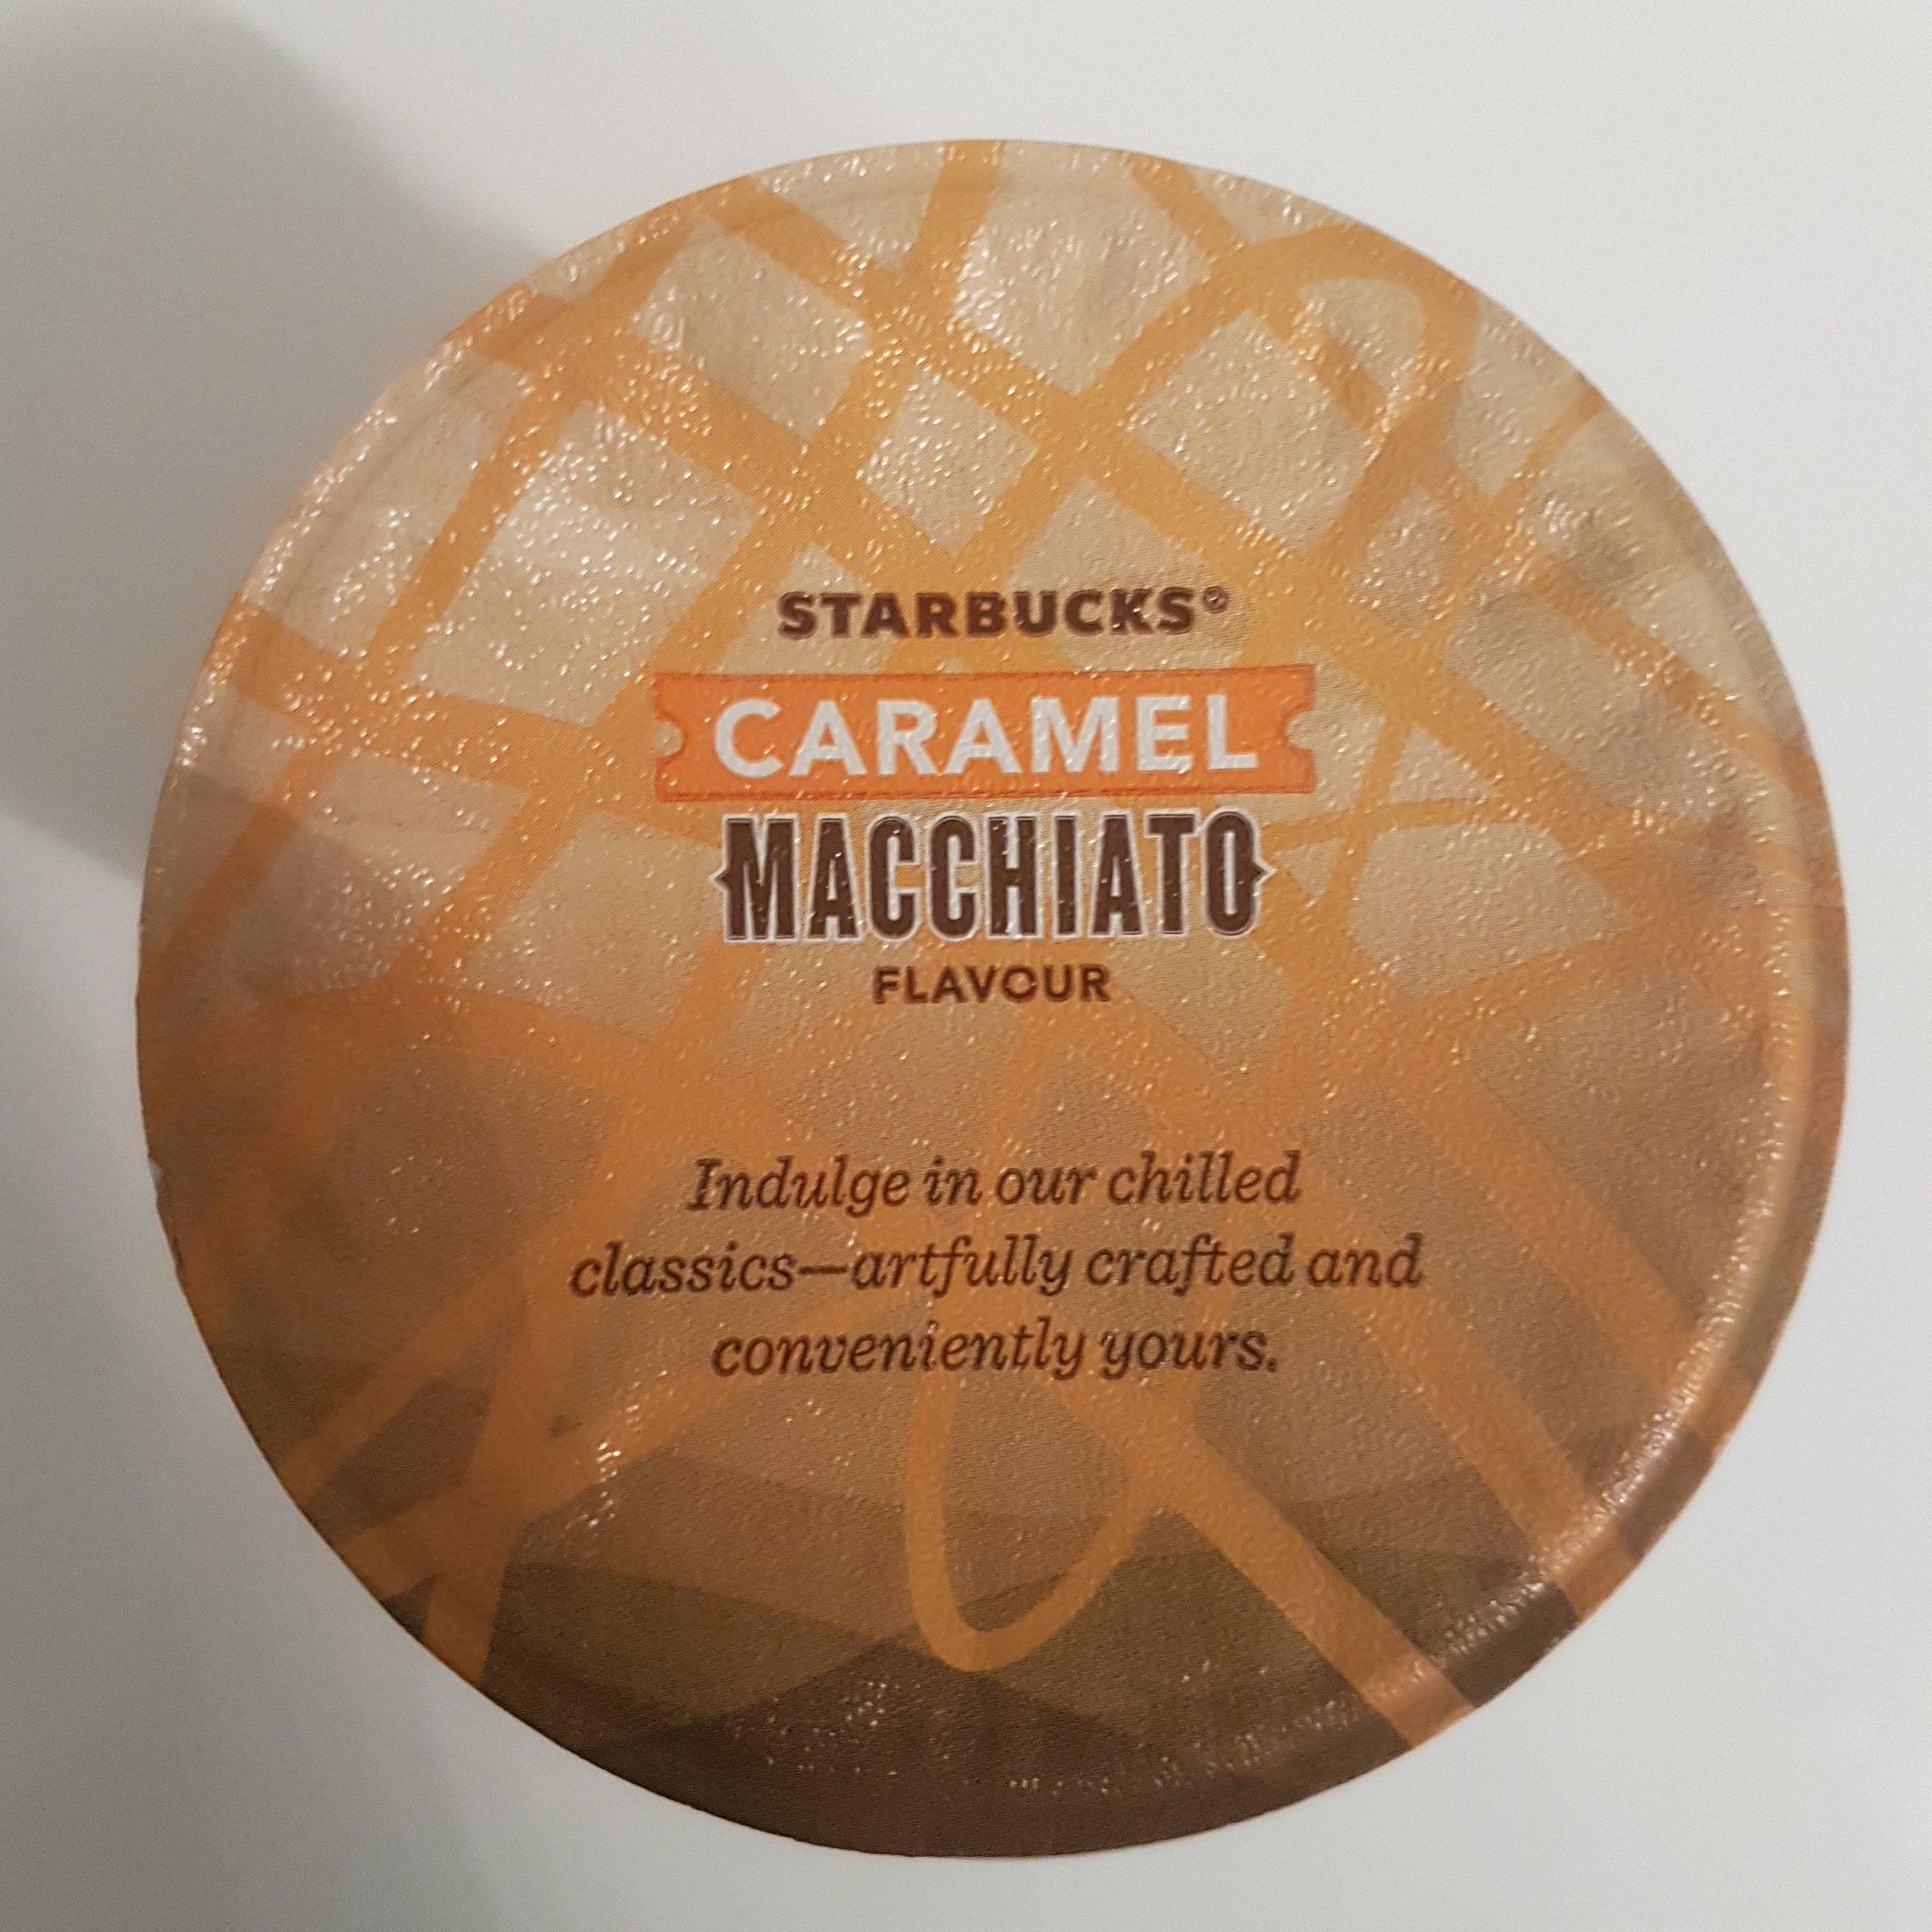 Starbucks® - Caramel Macchiato top - itstartswithacoffe.com #starbucks #caramelmacchiato #macchiato #coffee #itstartswithacoffee